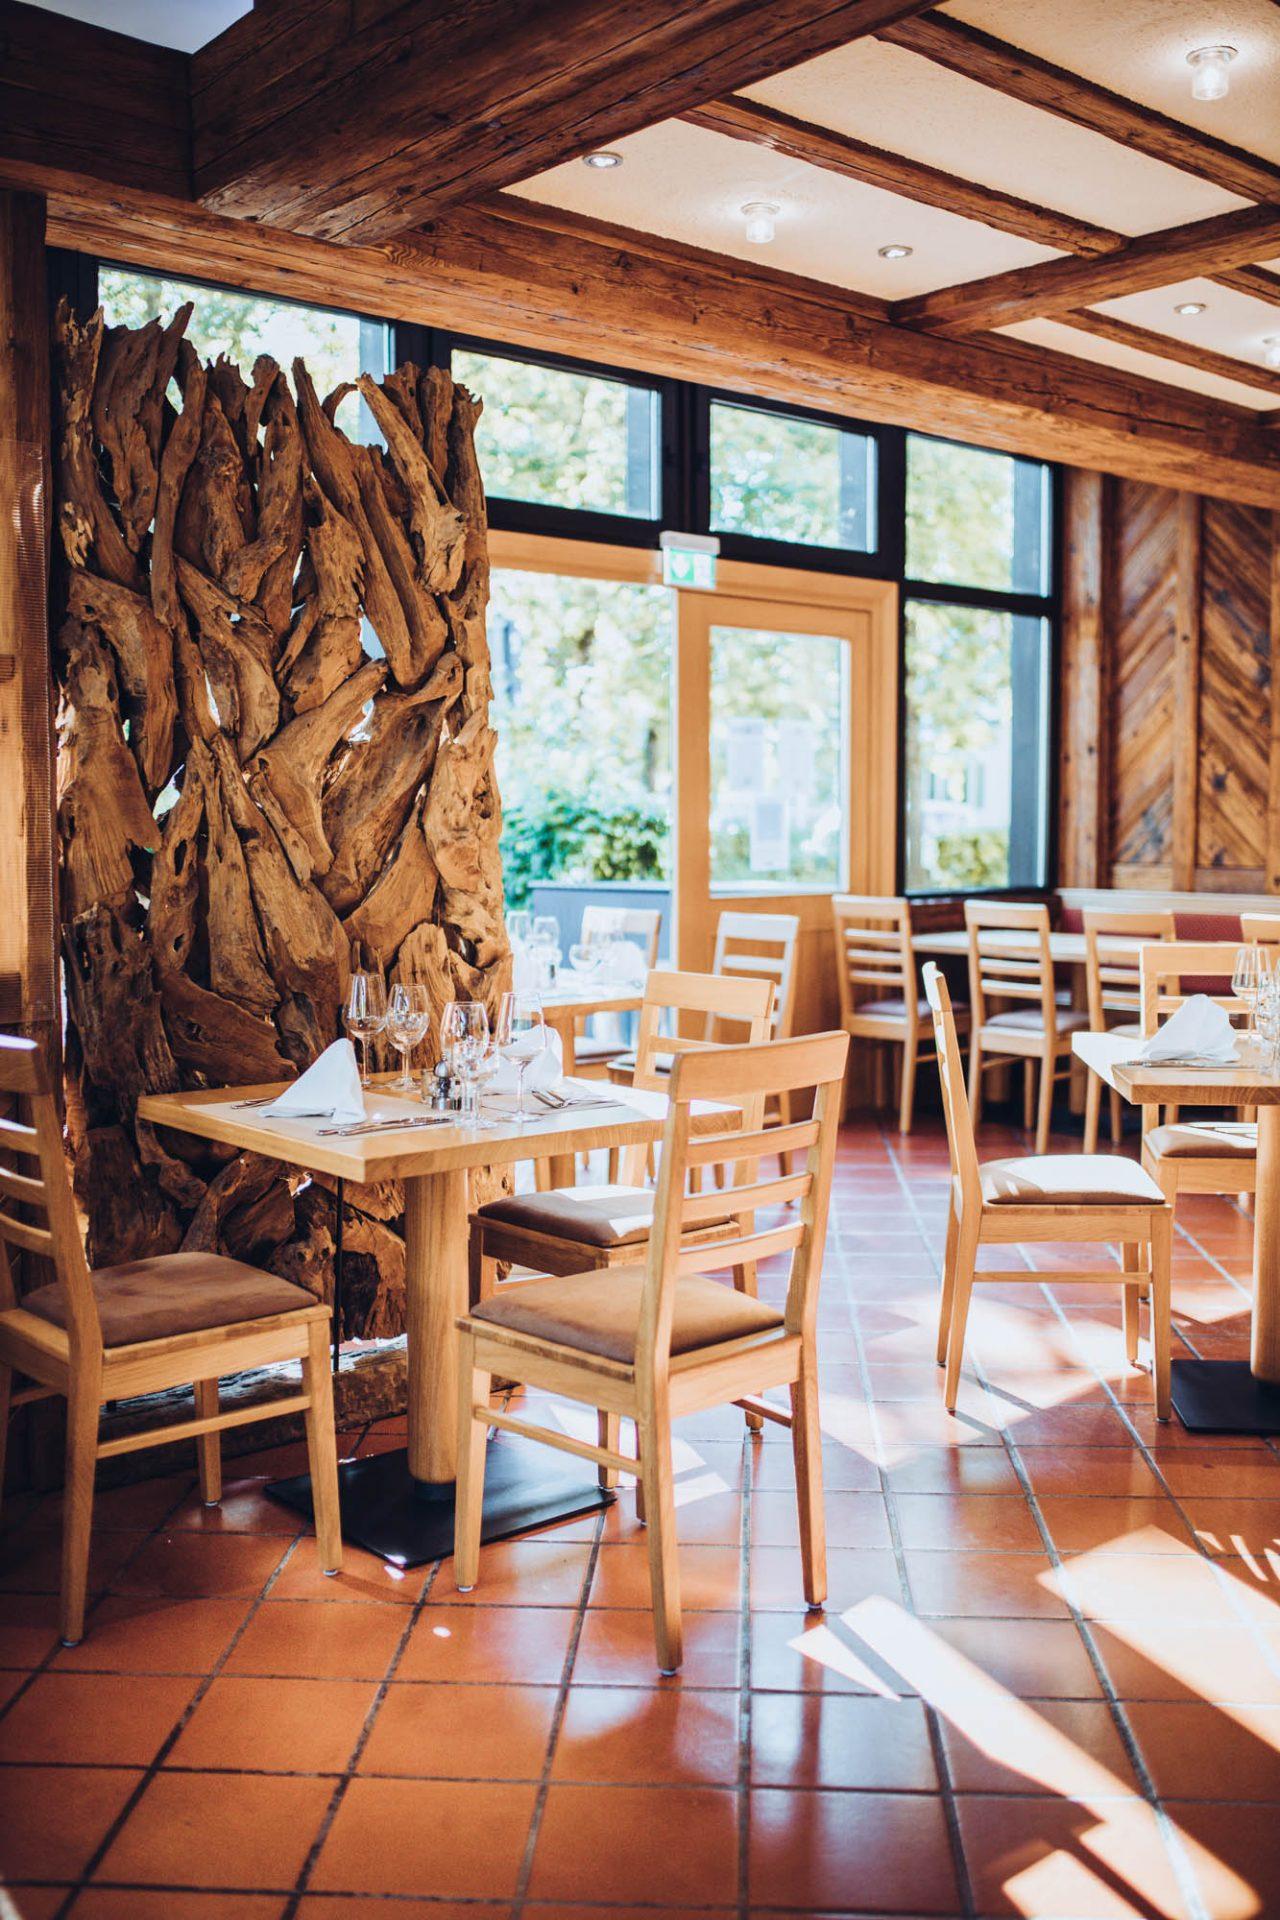 gavesi-eching-restaurant-062020-mokati-fotos-film-75